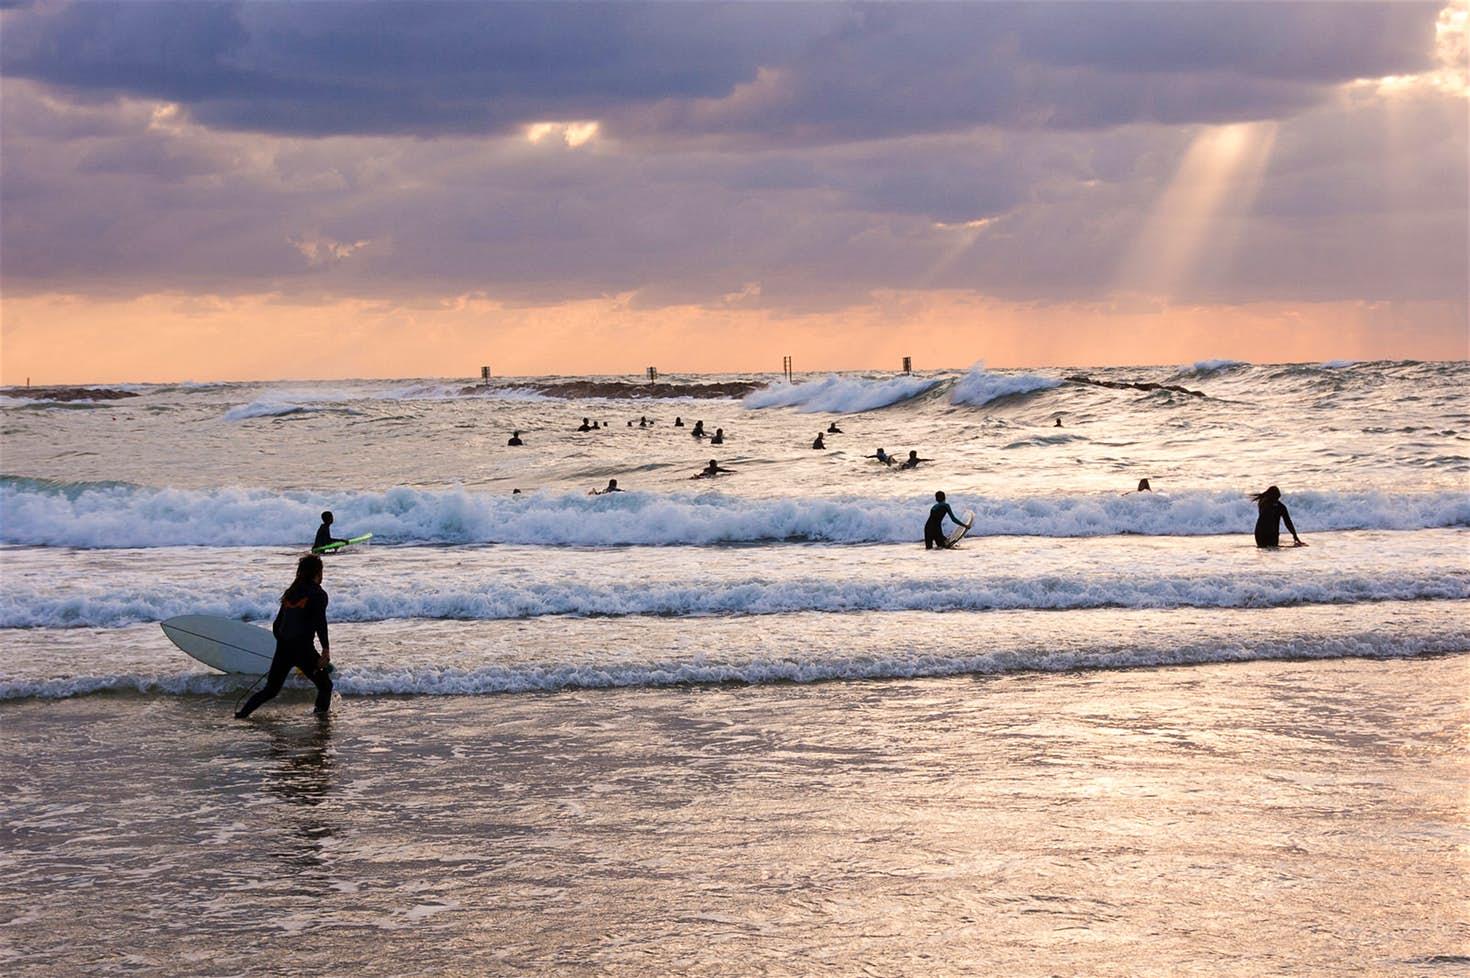 tel-aviv-beach-59f4c574aa8b